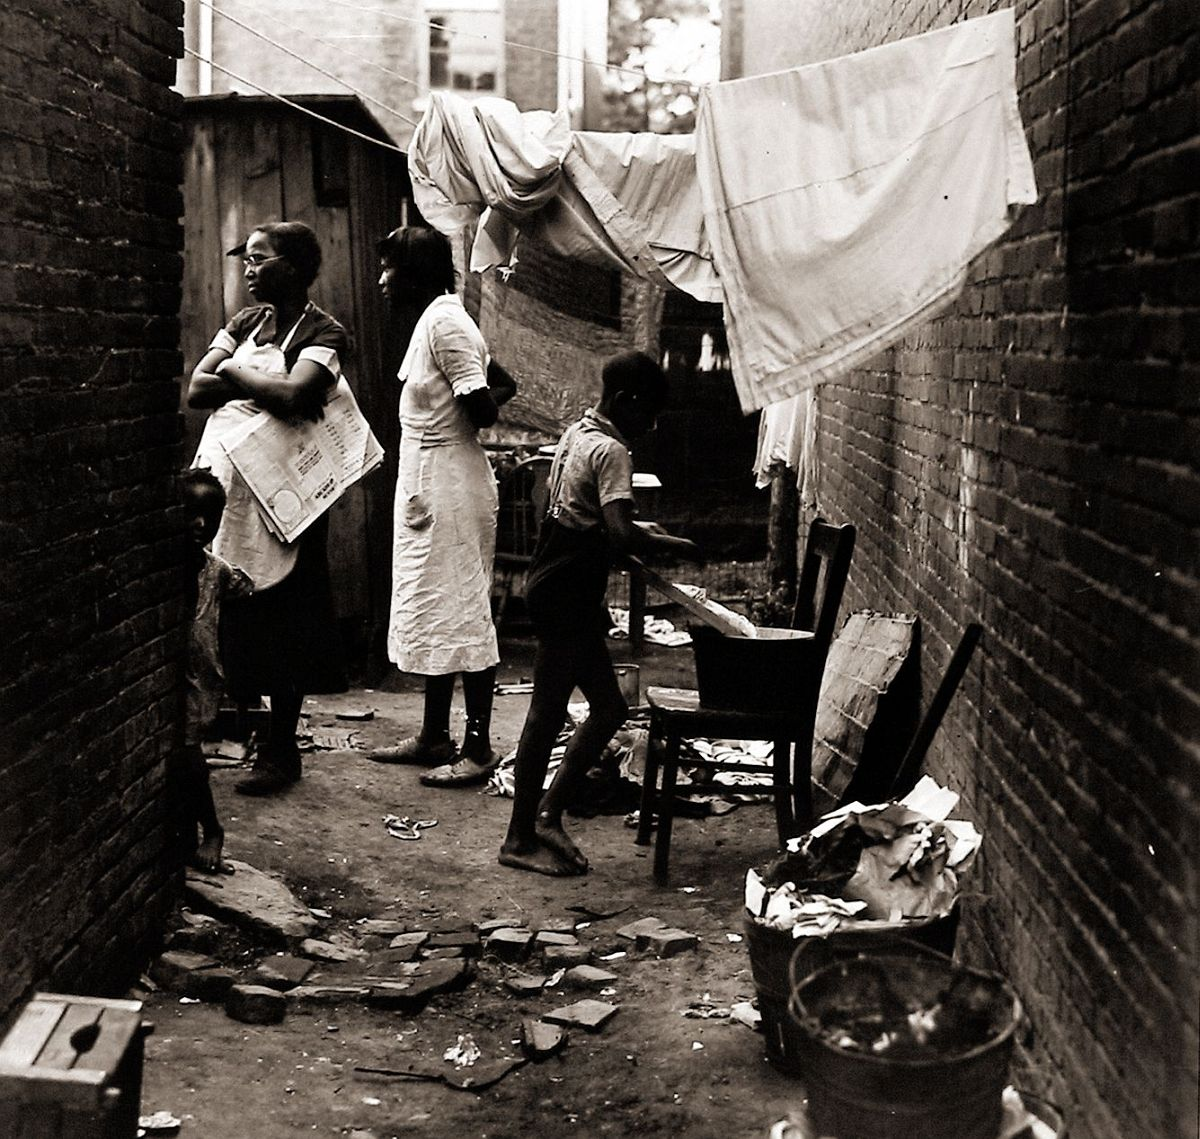 Peter Sekaer  Residents of slums in Washington, D.C., 1938